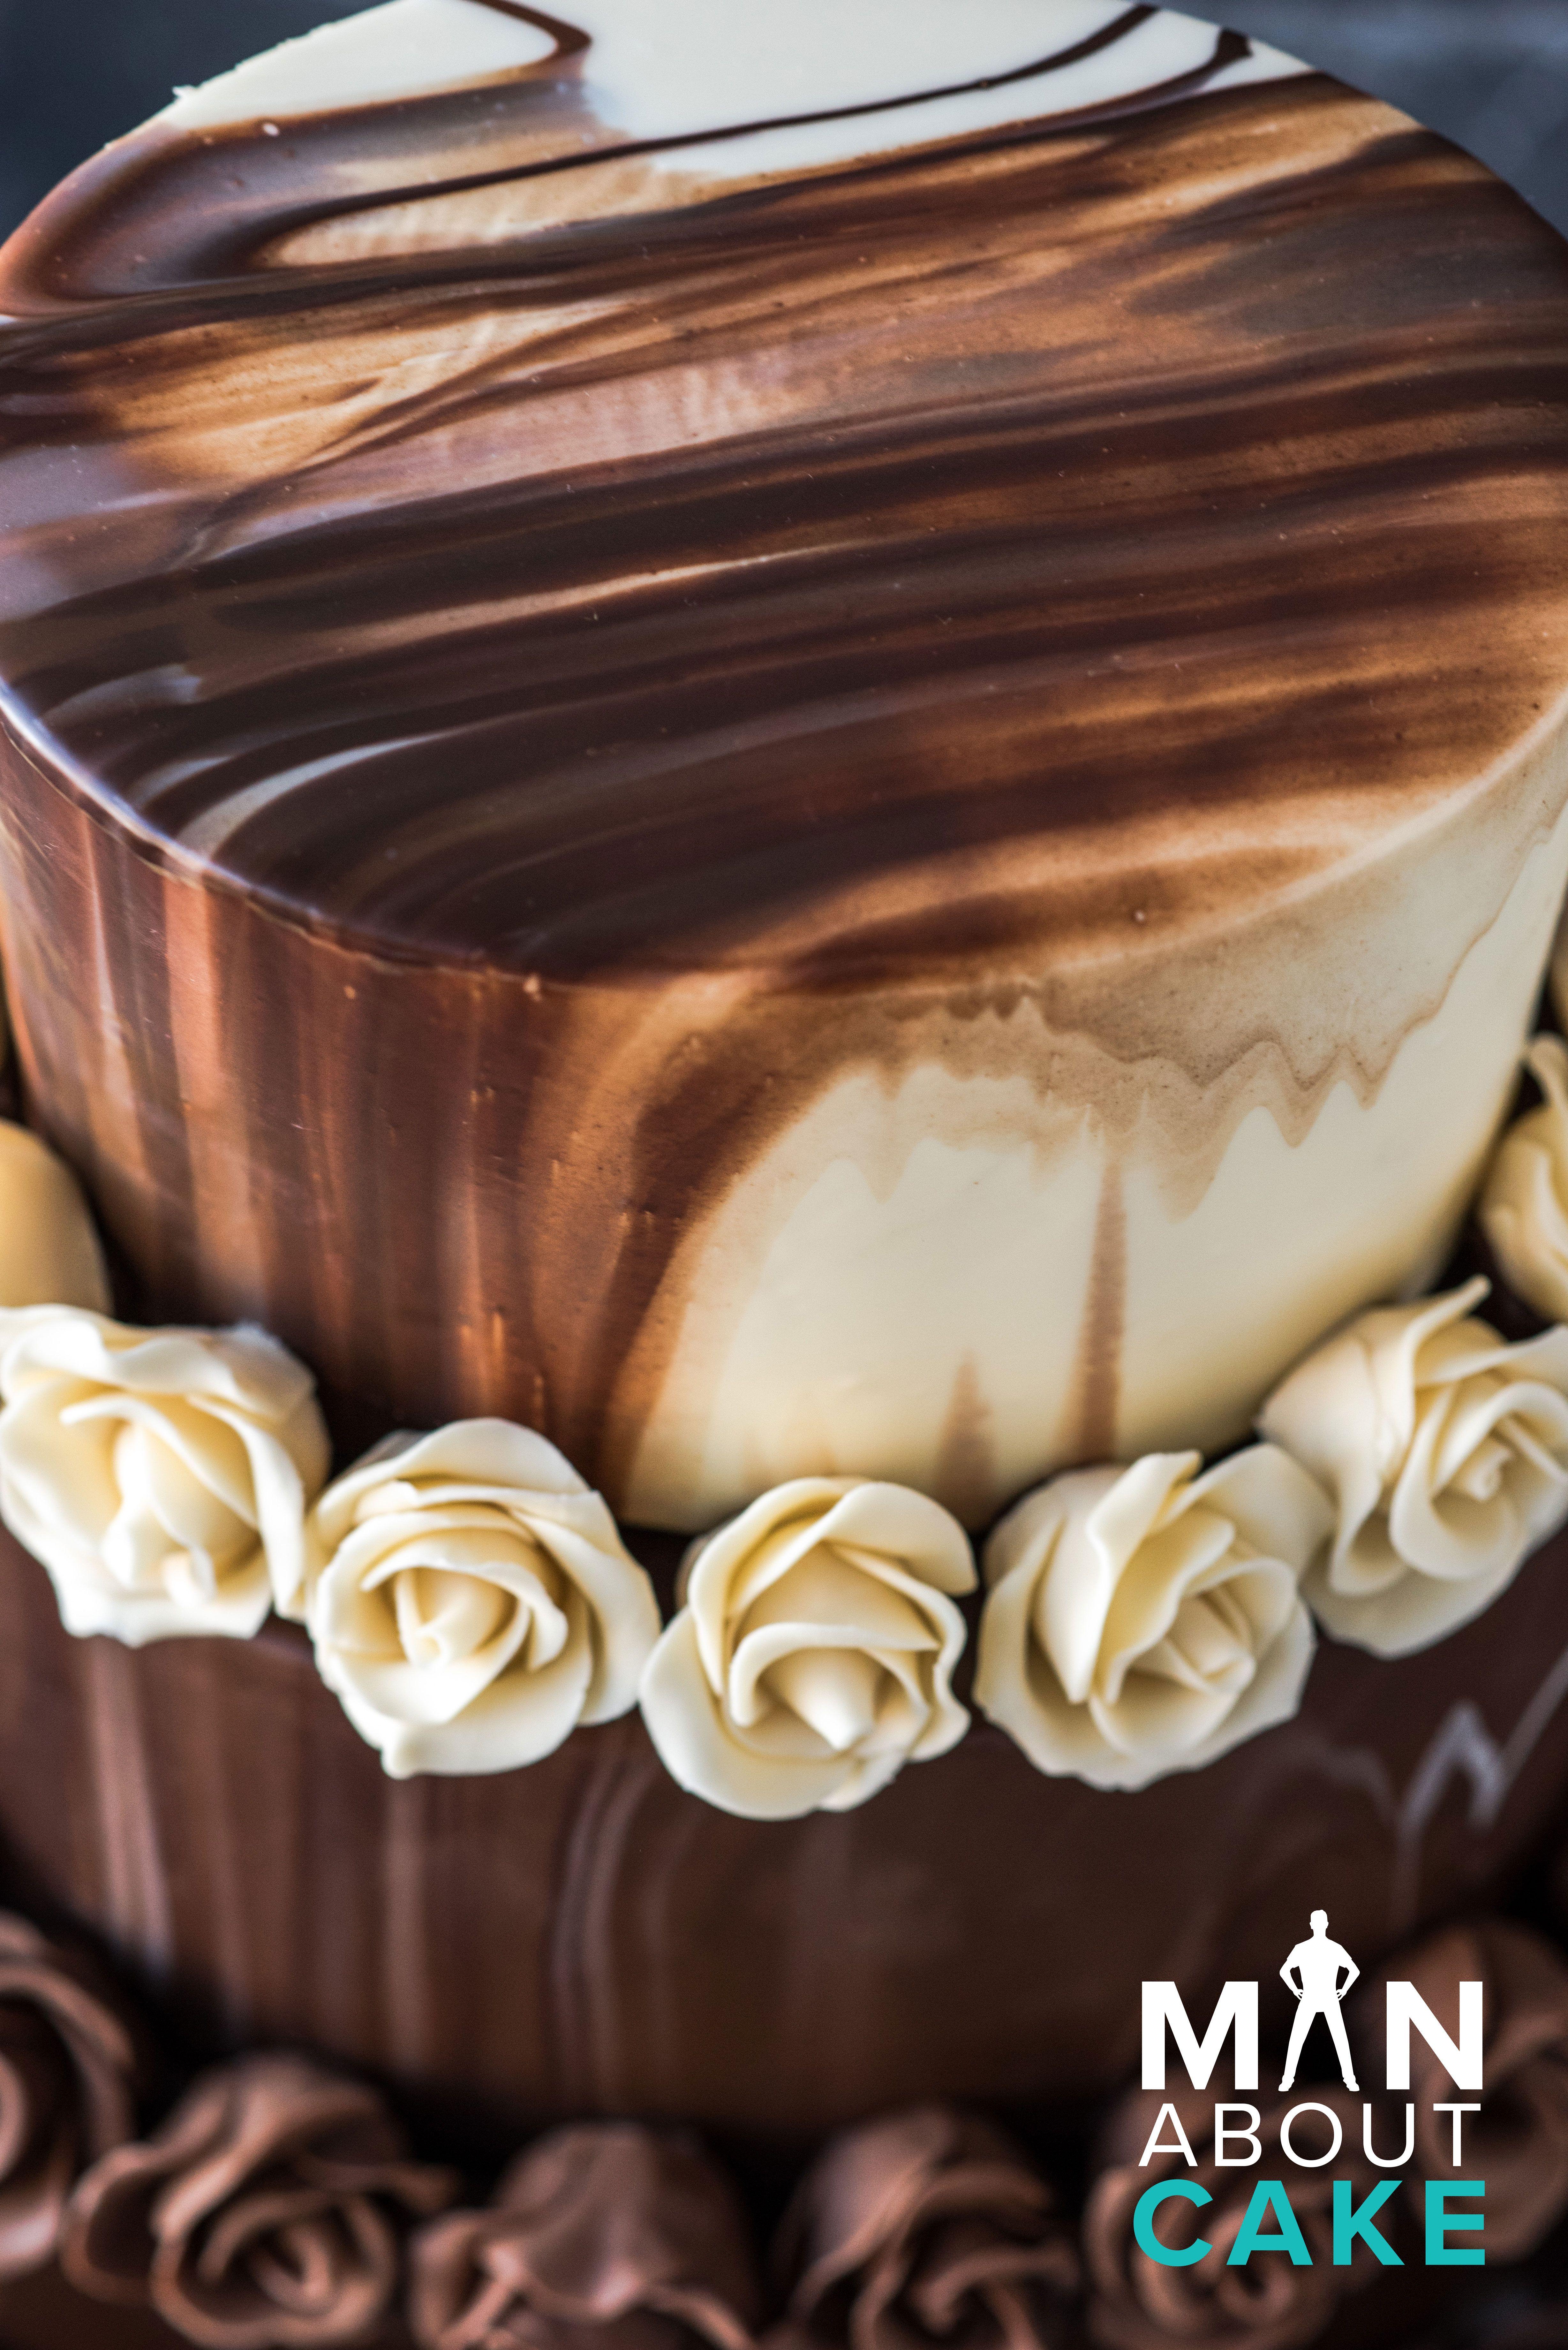 Chocolate Ganache Modeling Chocolate Roses By Joshua John